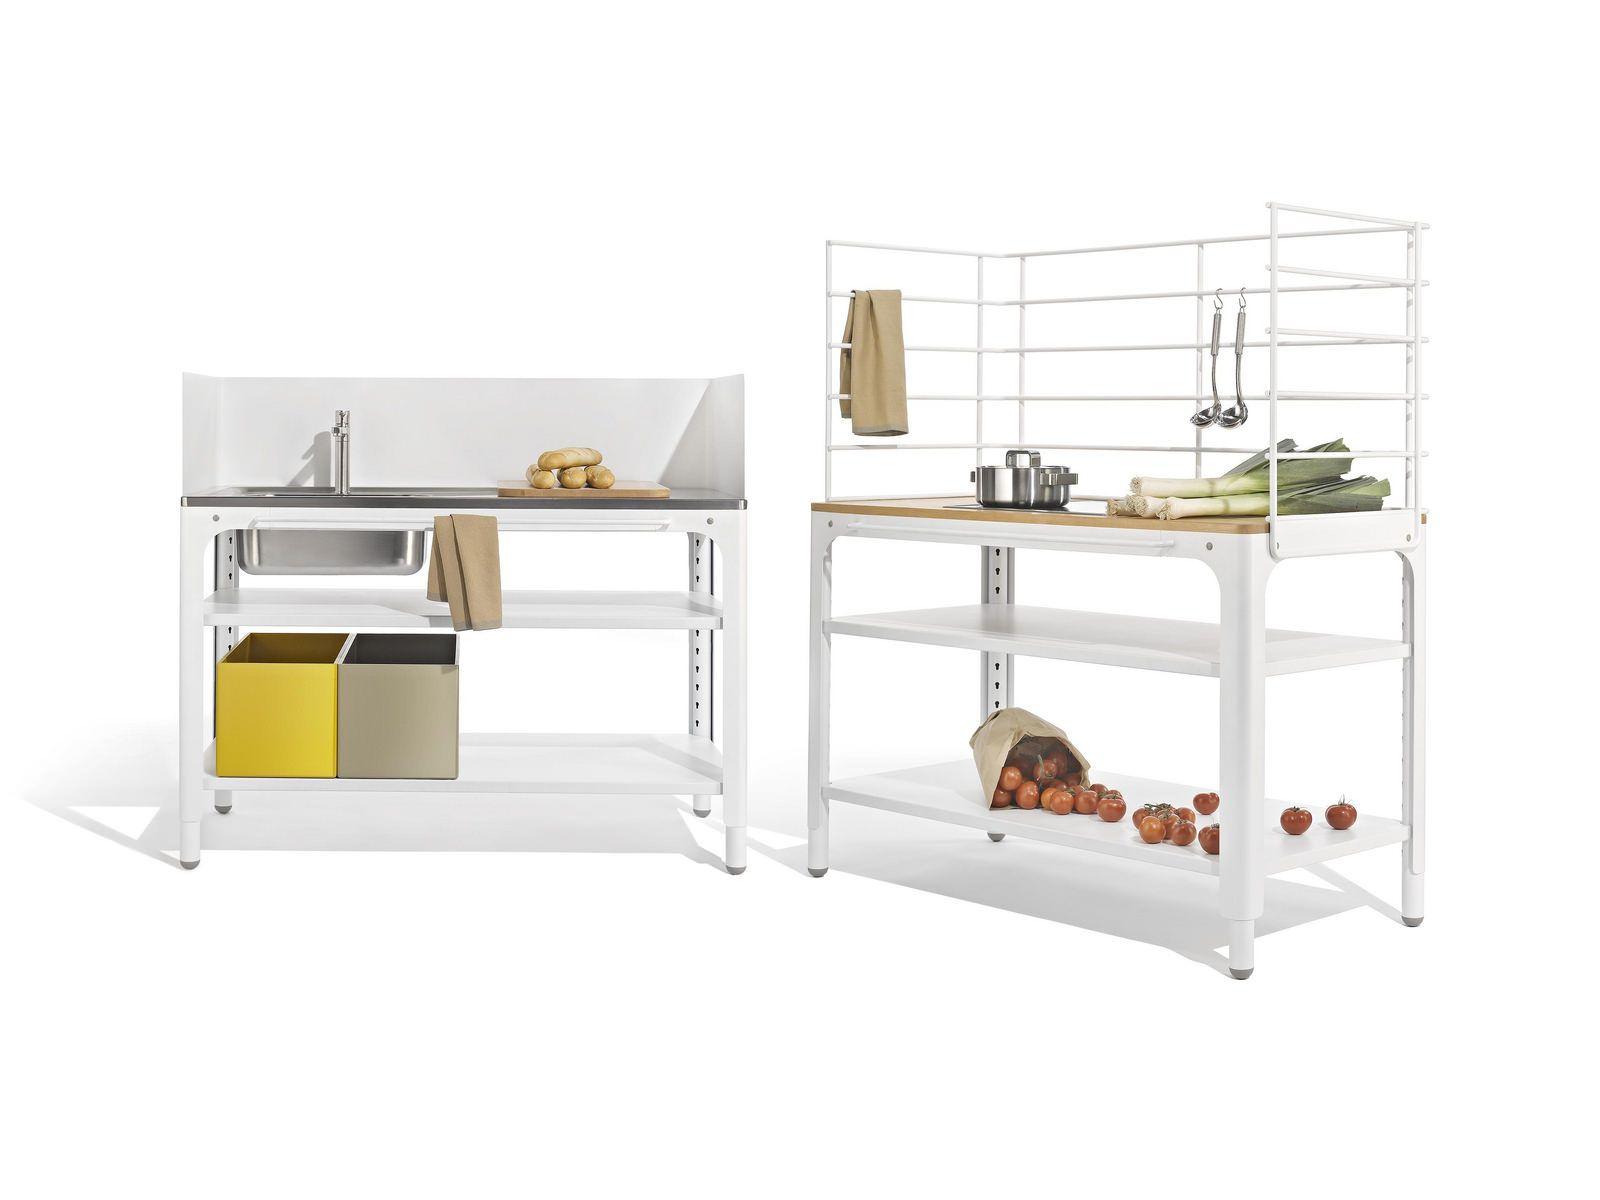 Groß Ikea Küchenevent Galerie - Kücheninsel Ideen - celavivar.com